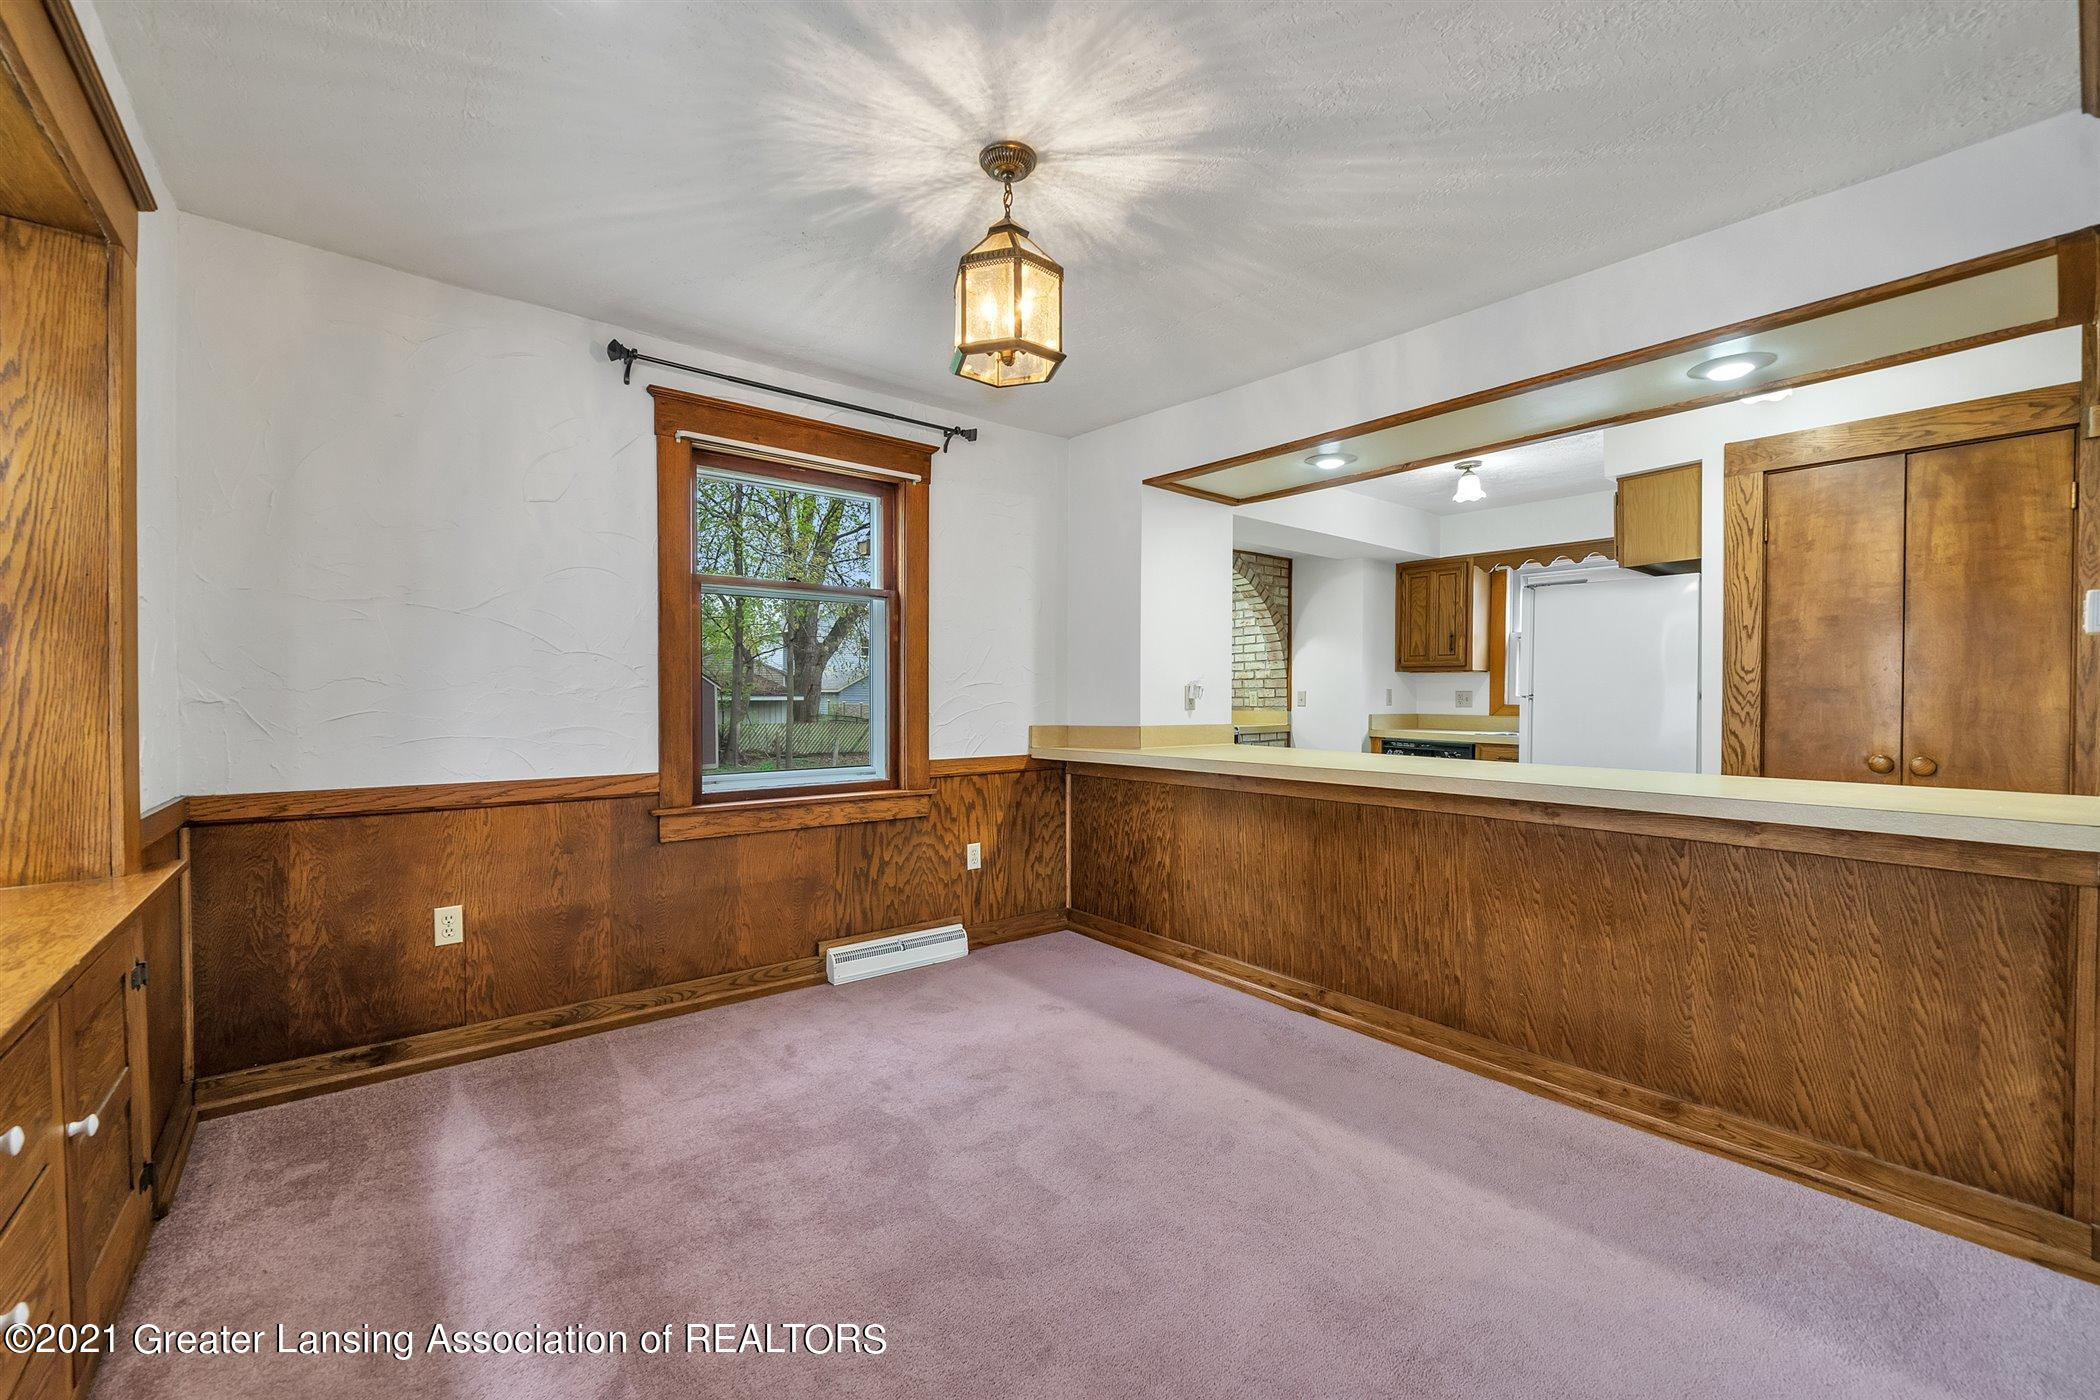 726 N Magnolia Ave - (6) MAIN FLOOR Dining Room - 7